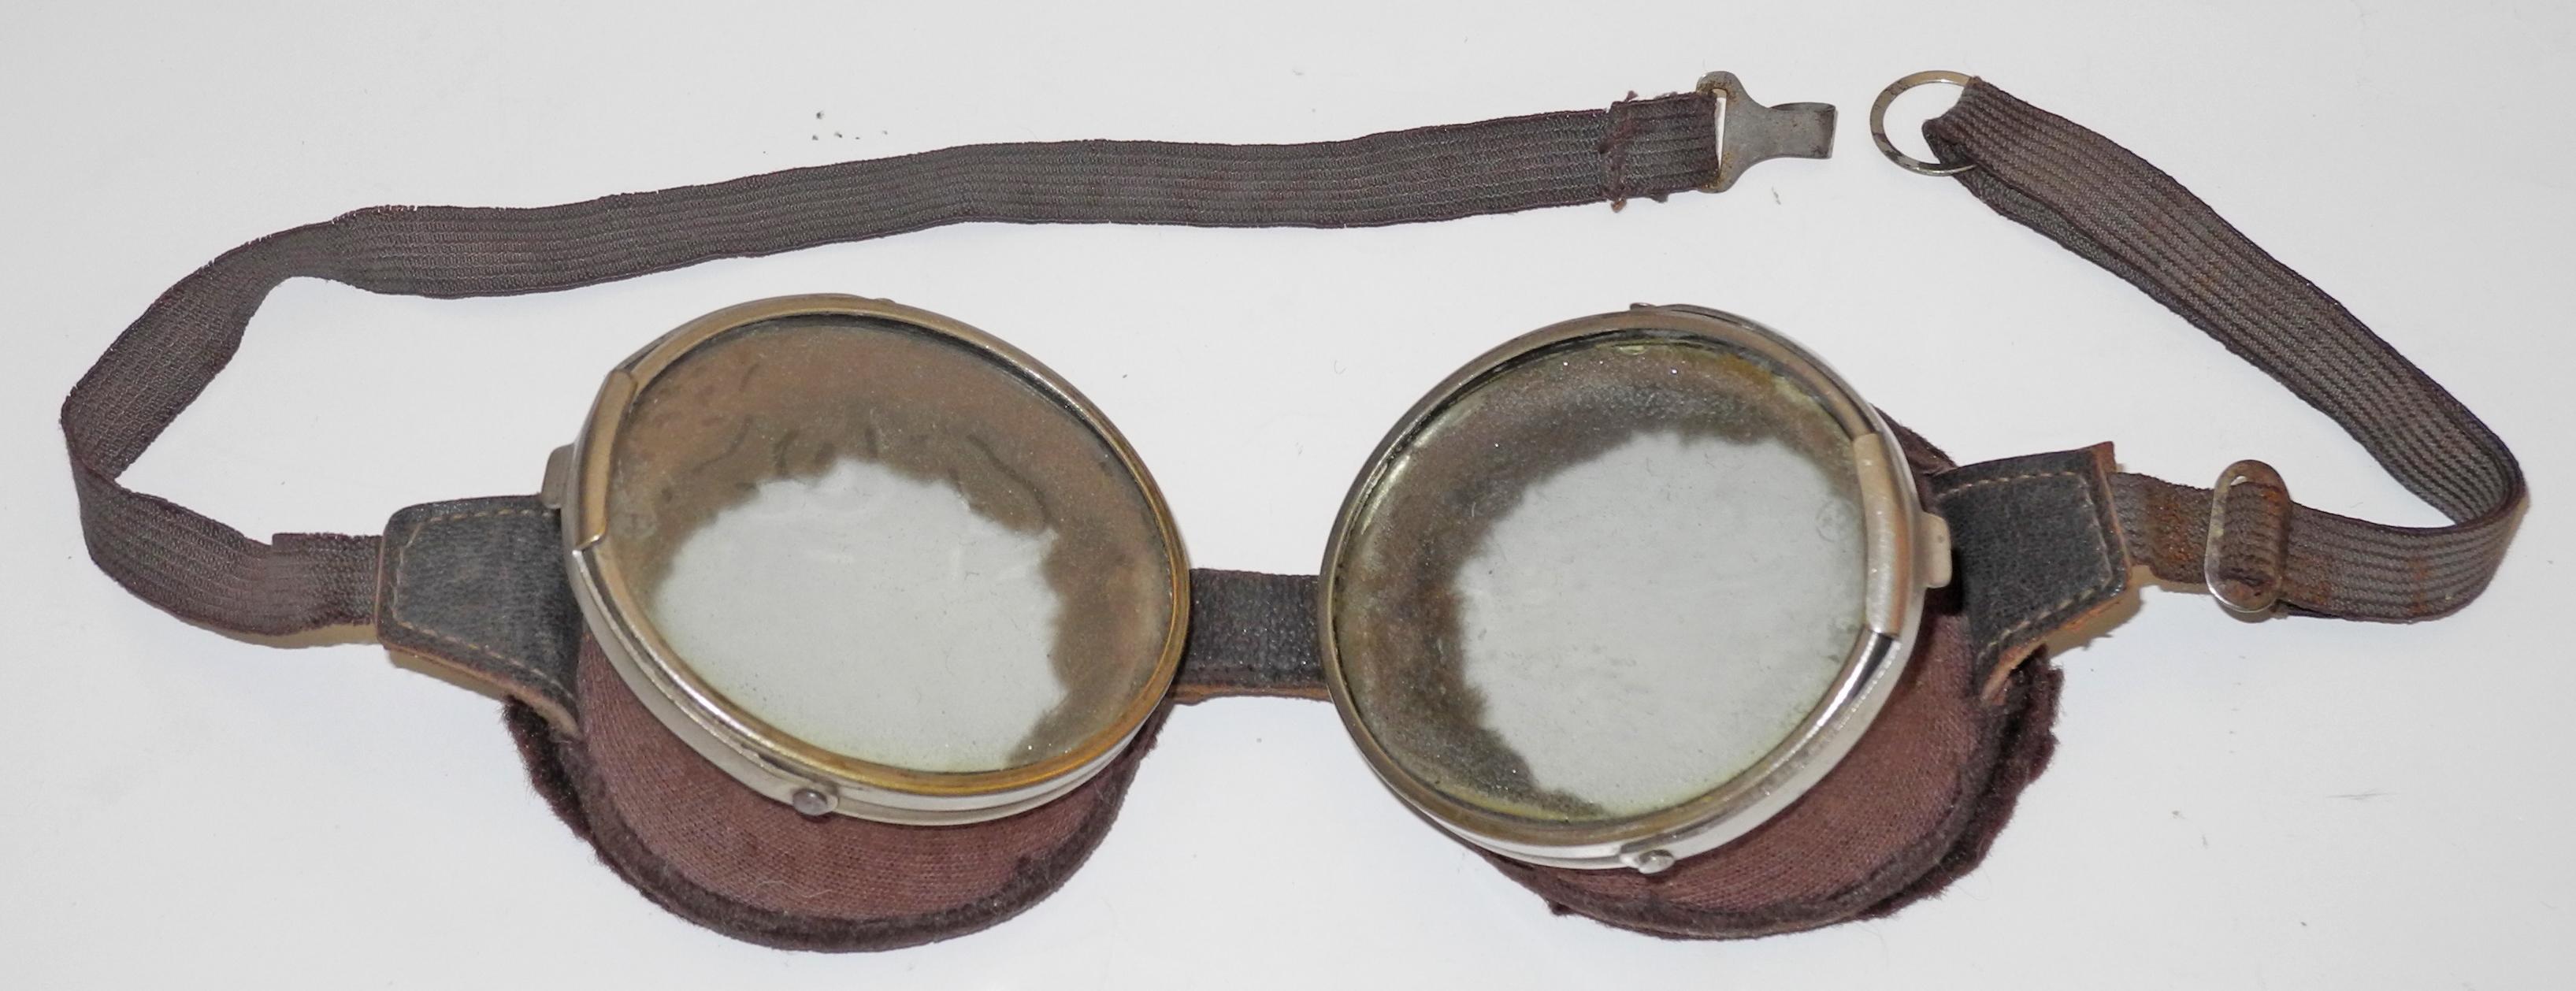 RFC aviator goggles by Triplex